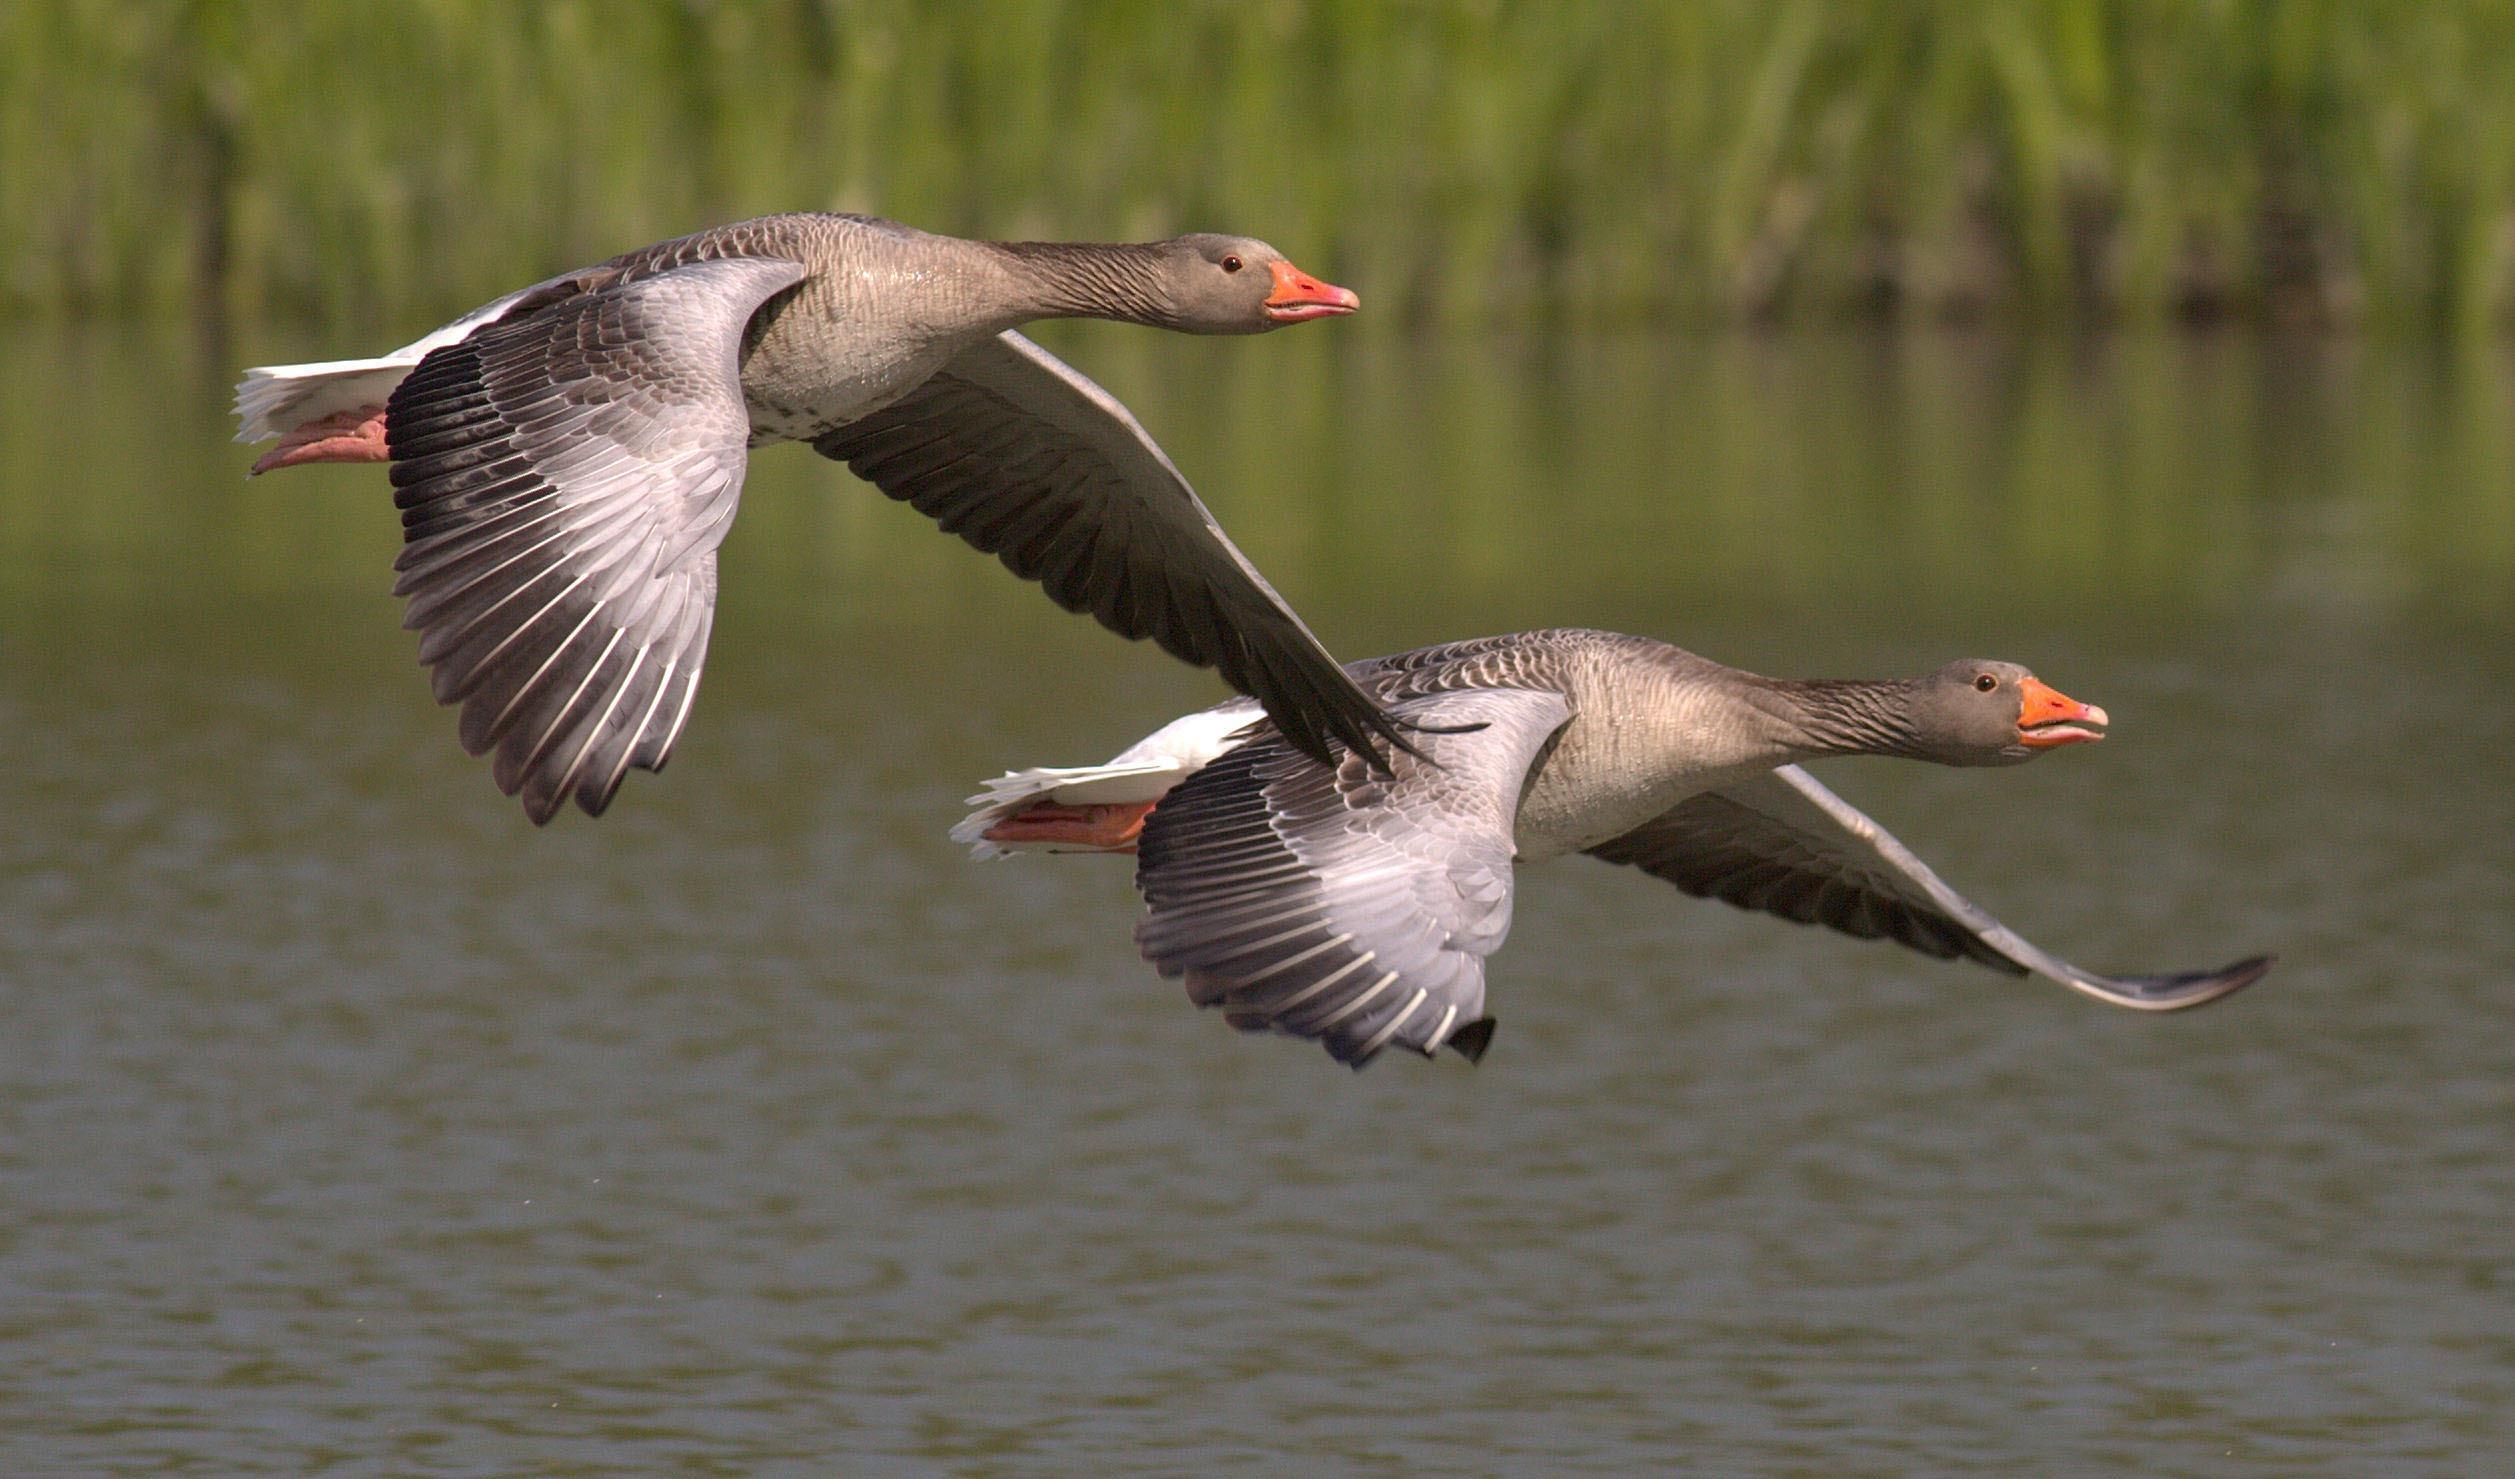 two birds in flight free stock photo